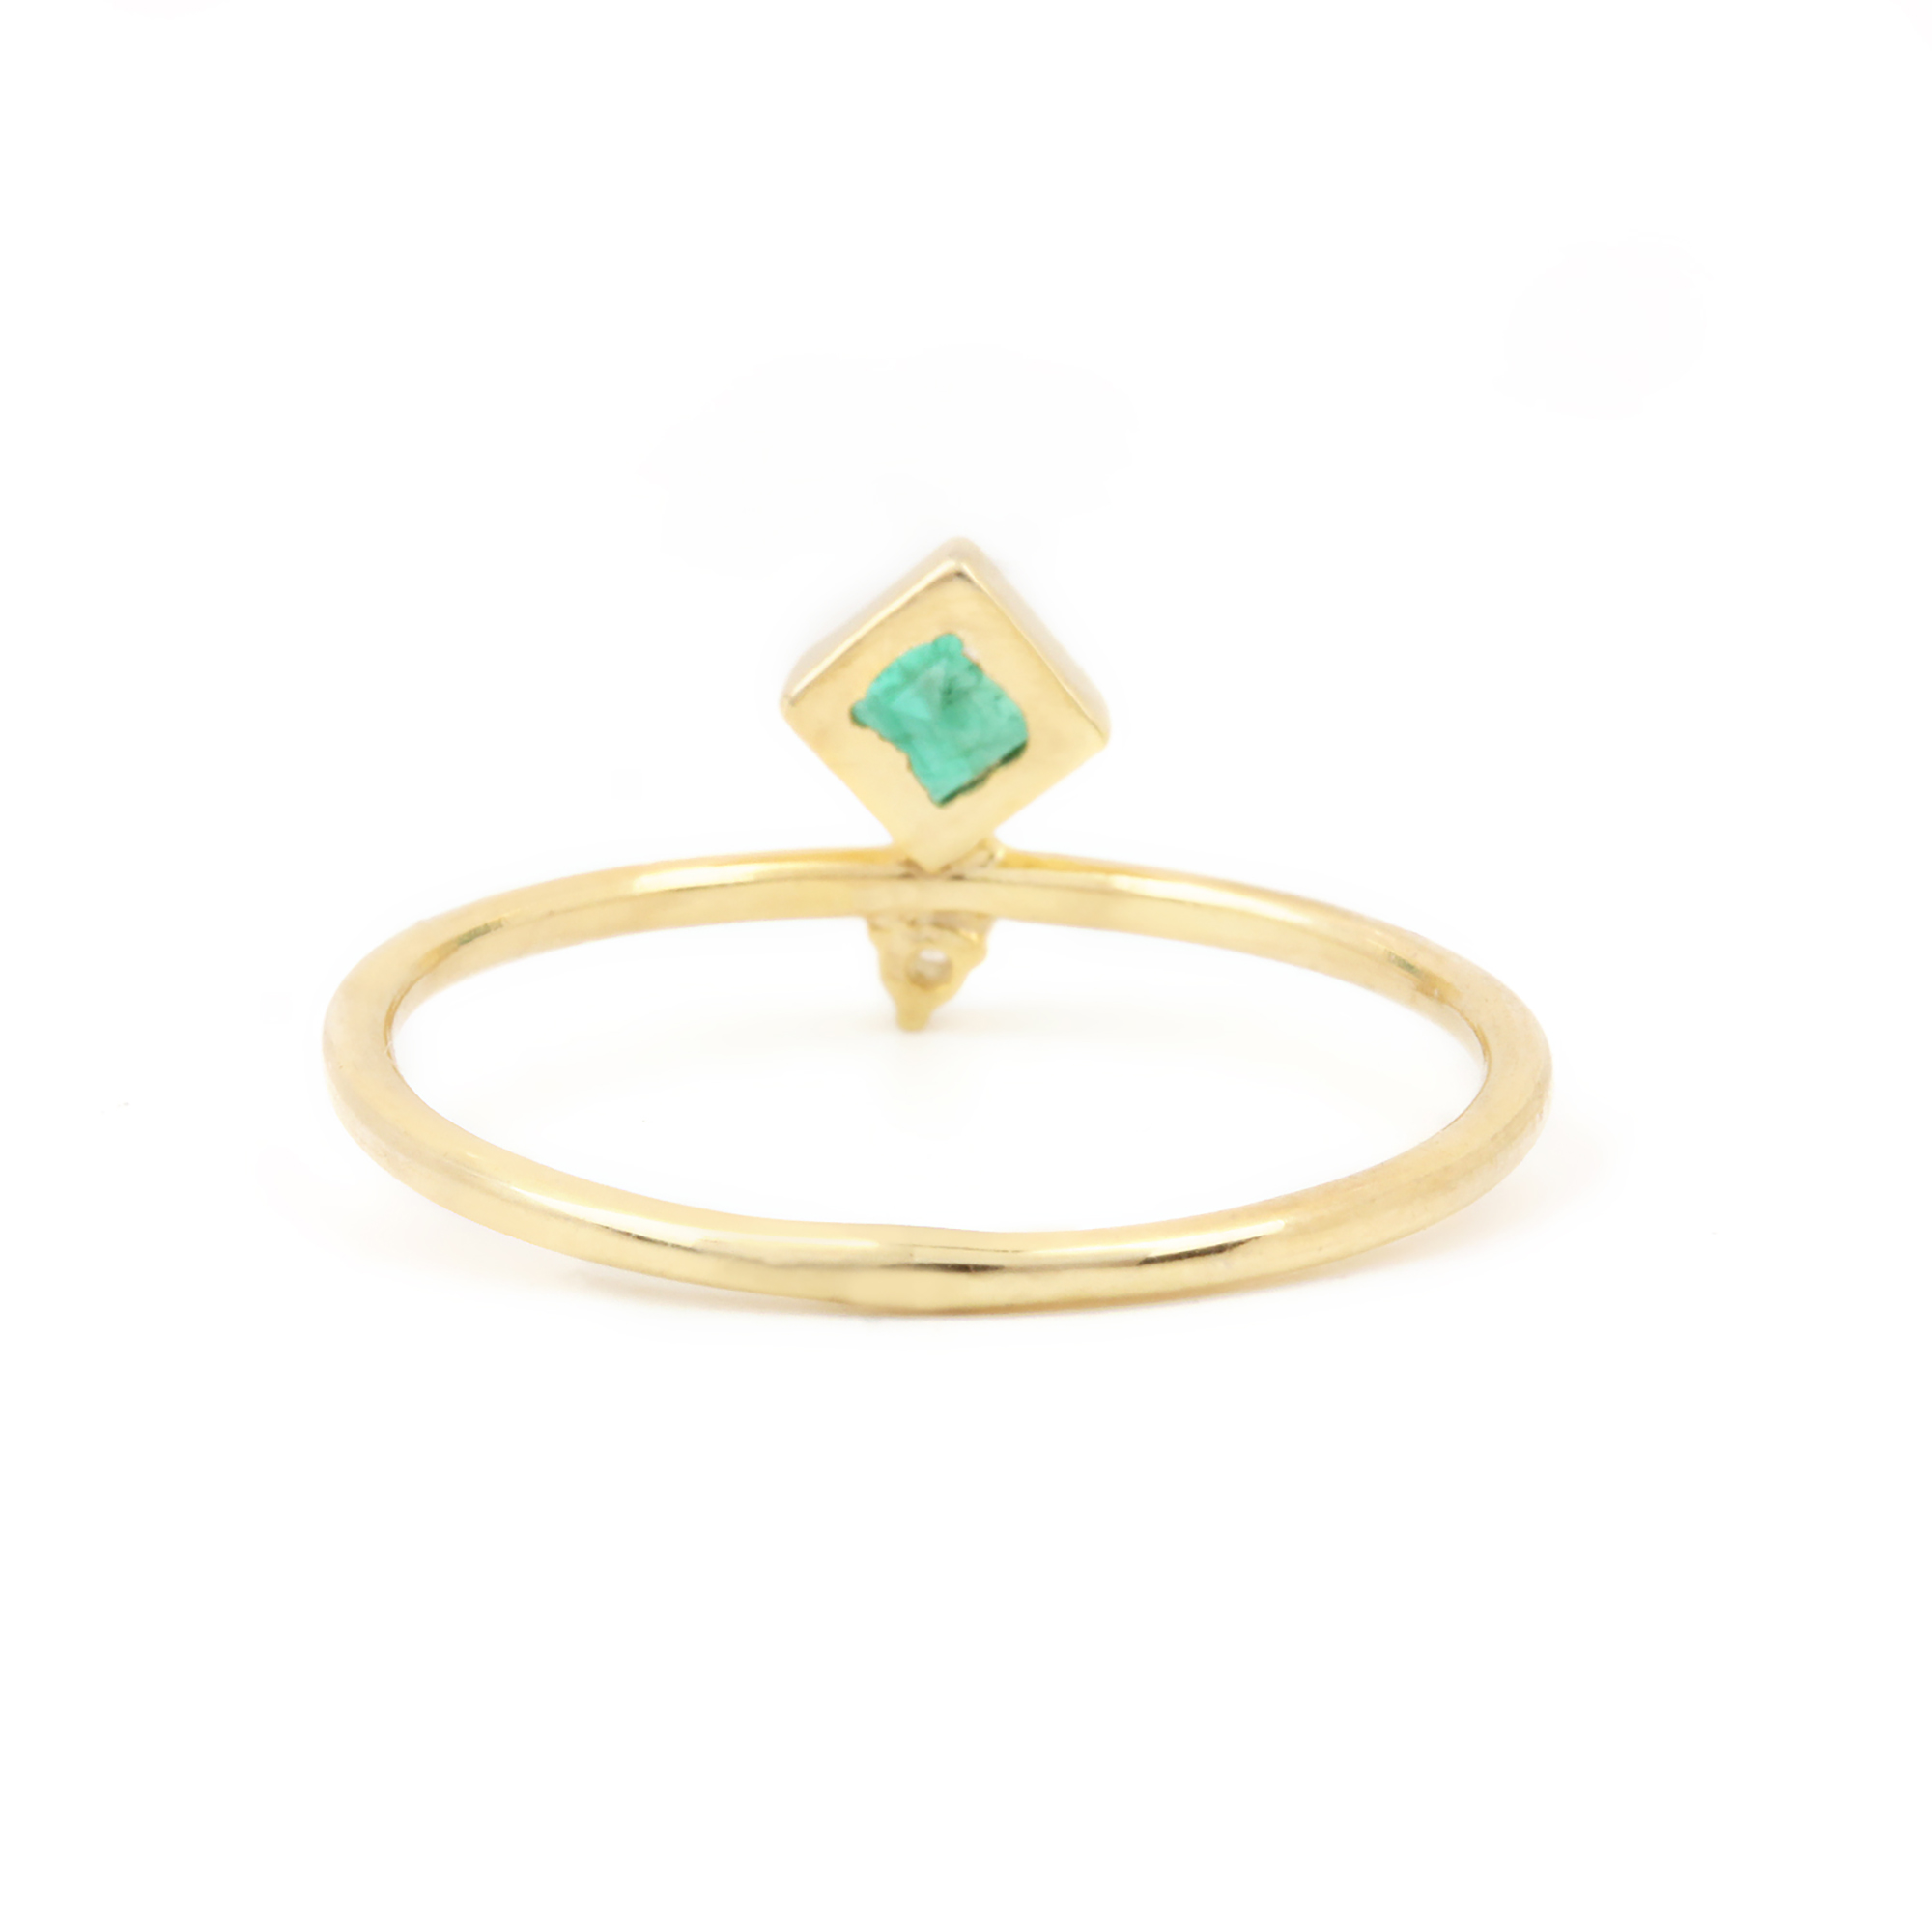 14k Solid Yellow Gold Diamond Emerald Ring Fine Jewelry